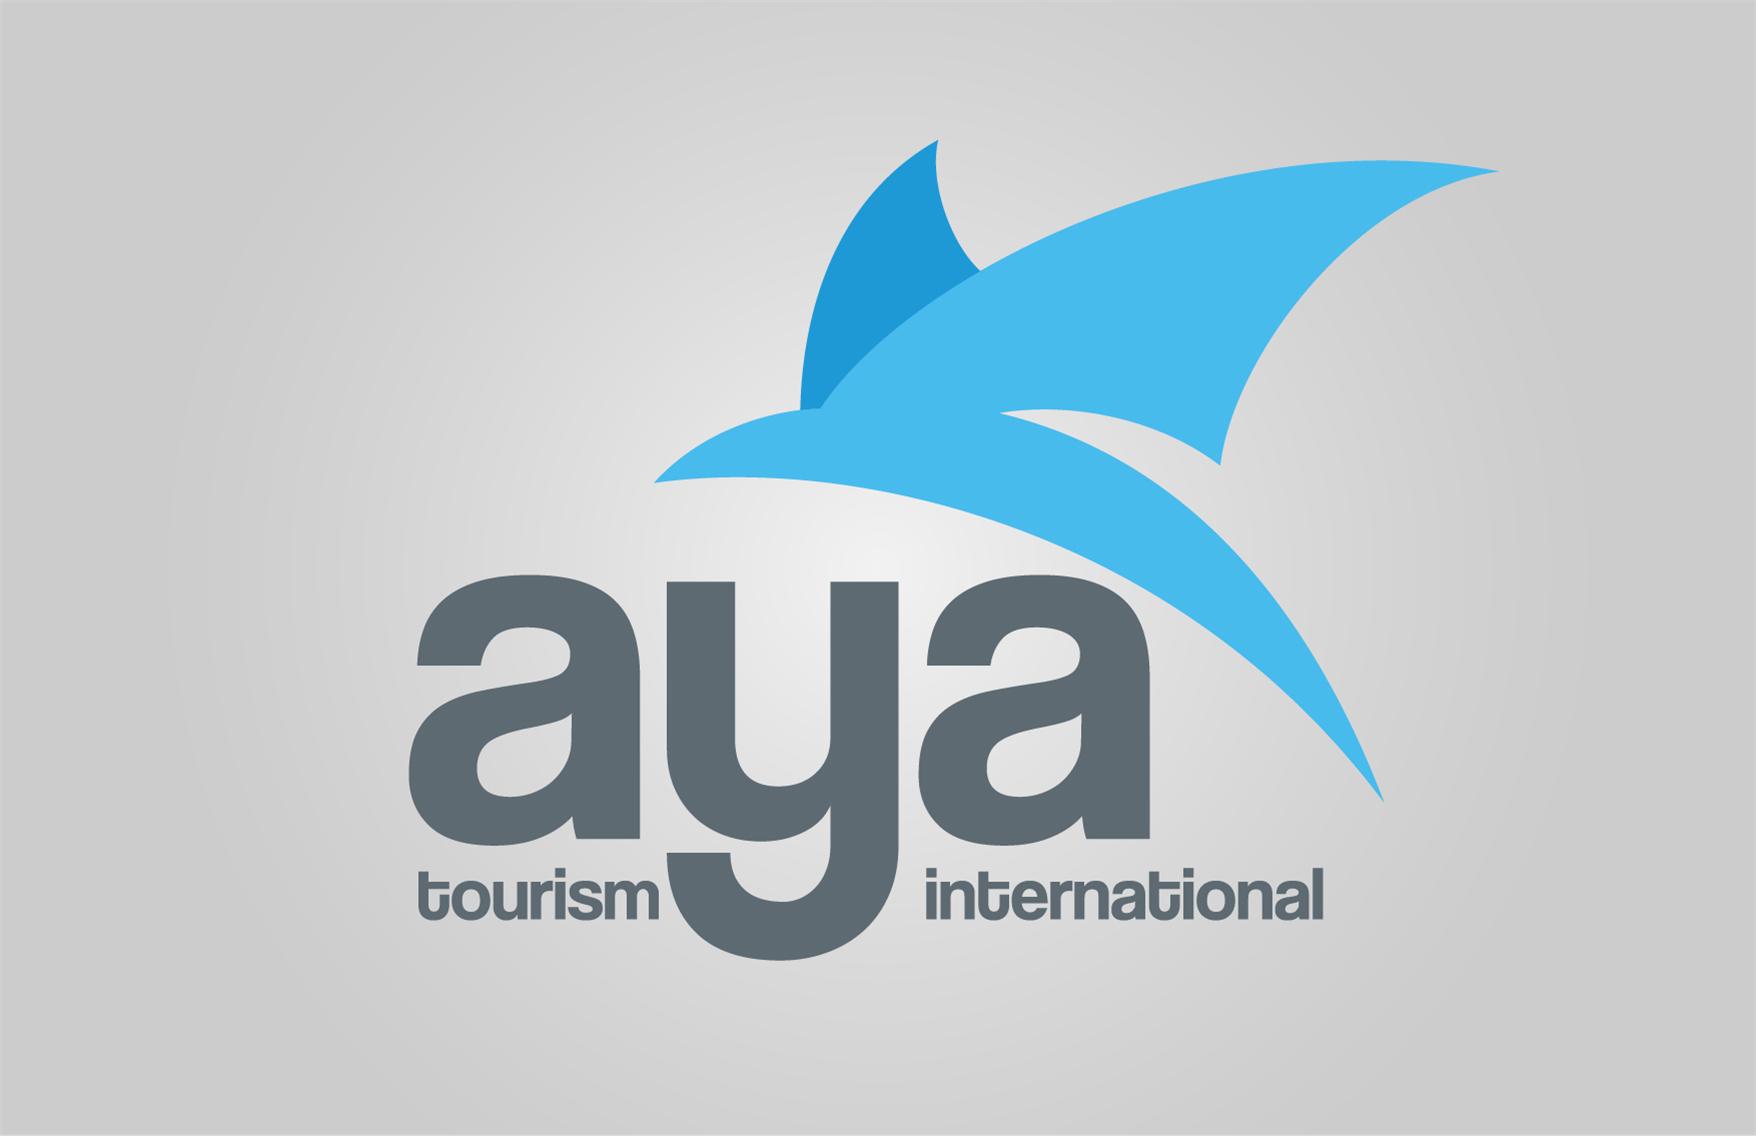 aya tourism international